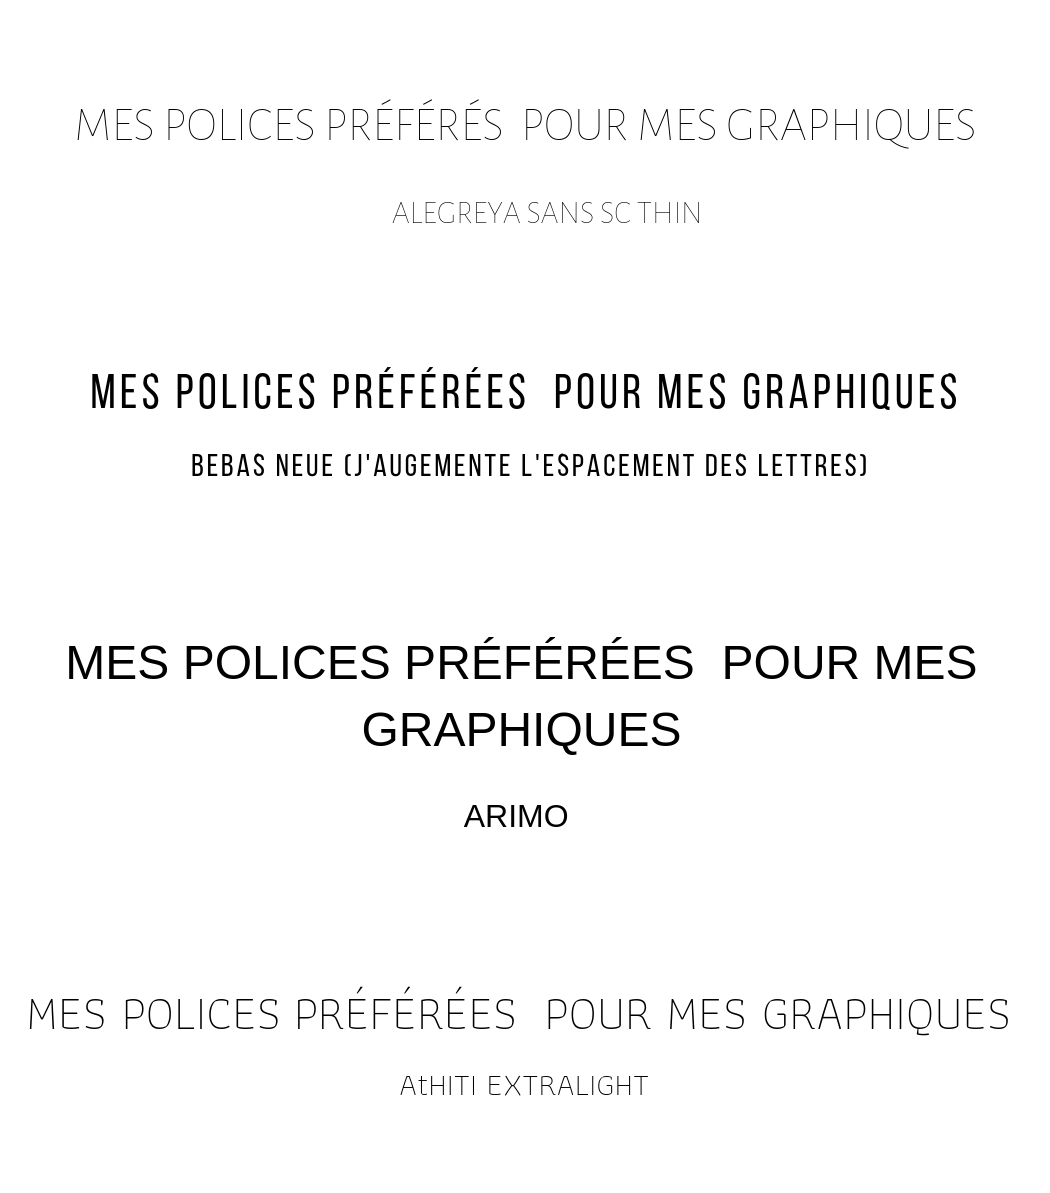 font police adobe graphique